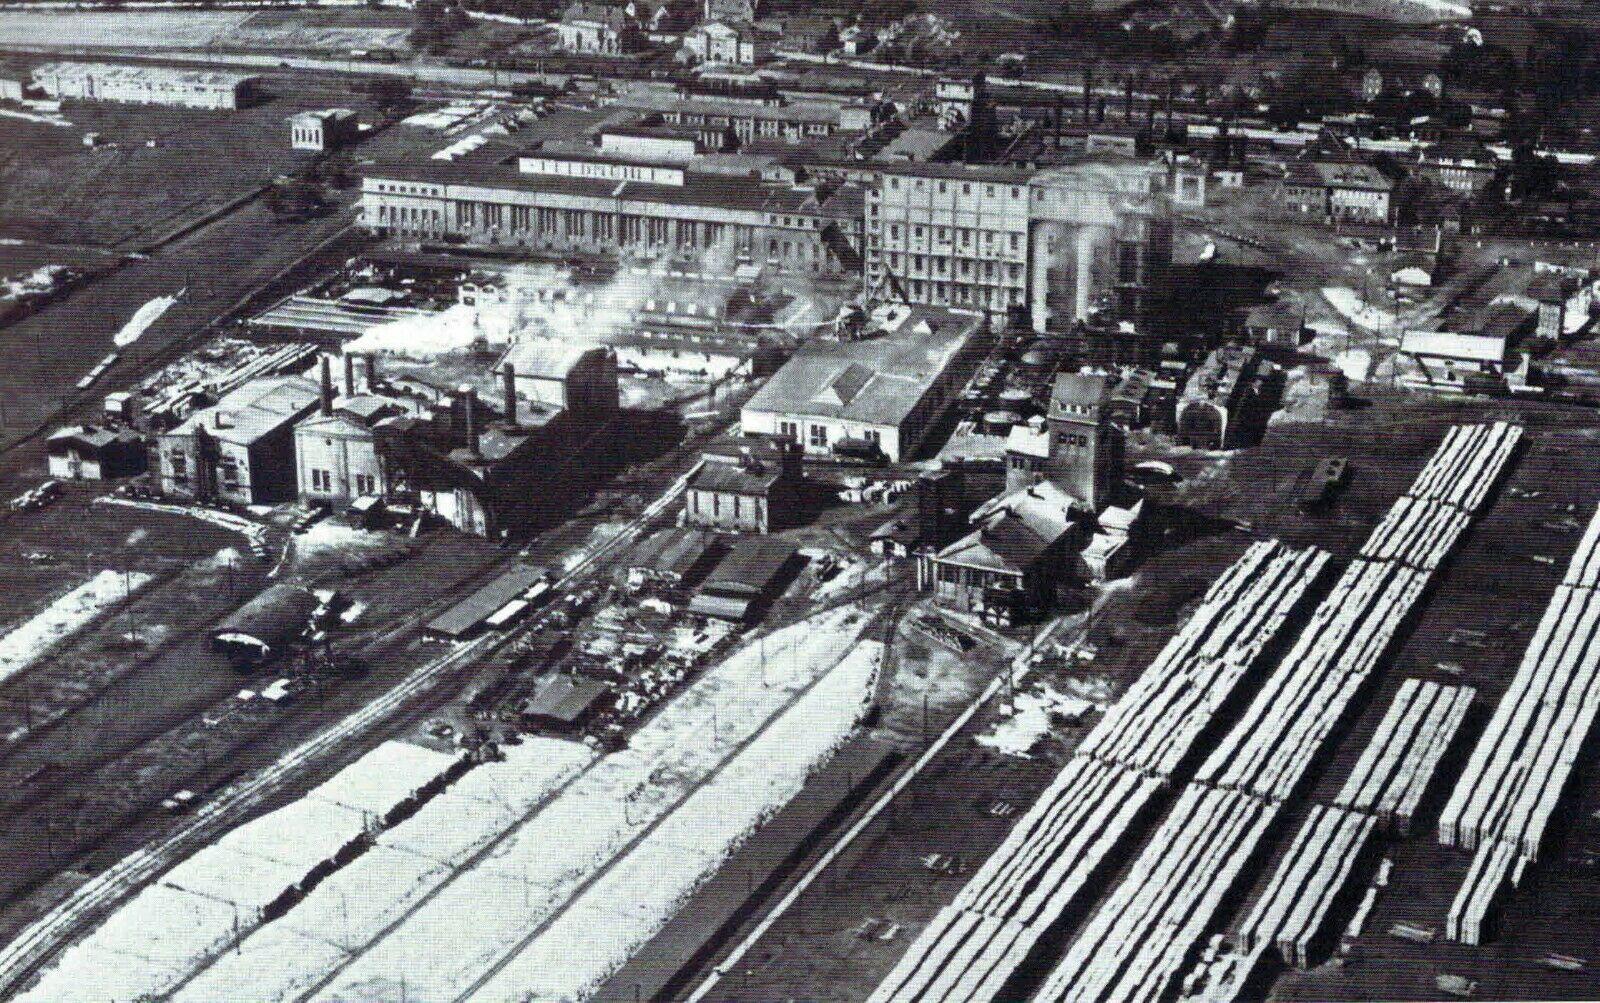 Stettin Szczecin Papierfabrik Feldmuhle Luftbild Pommern 1931